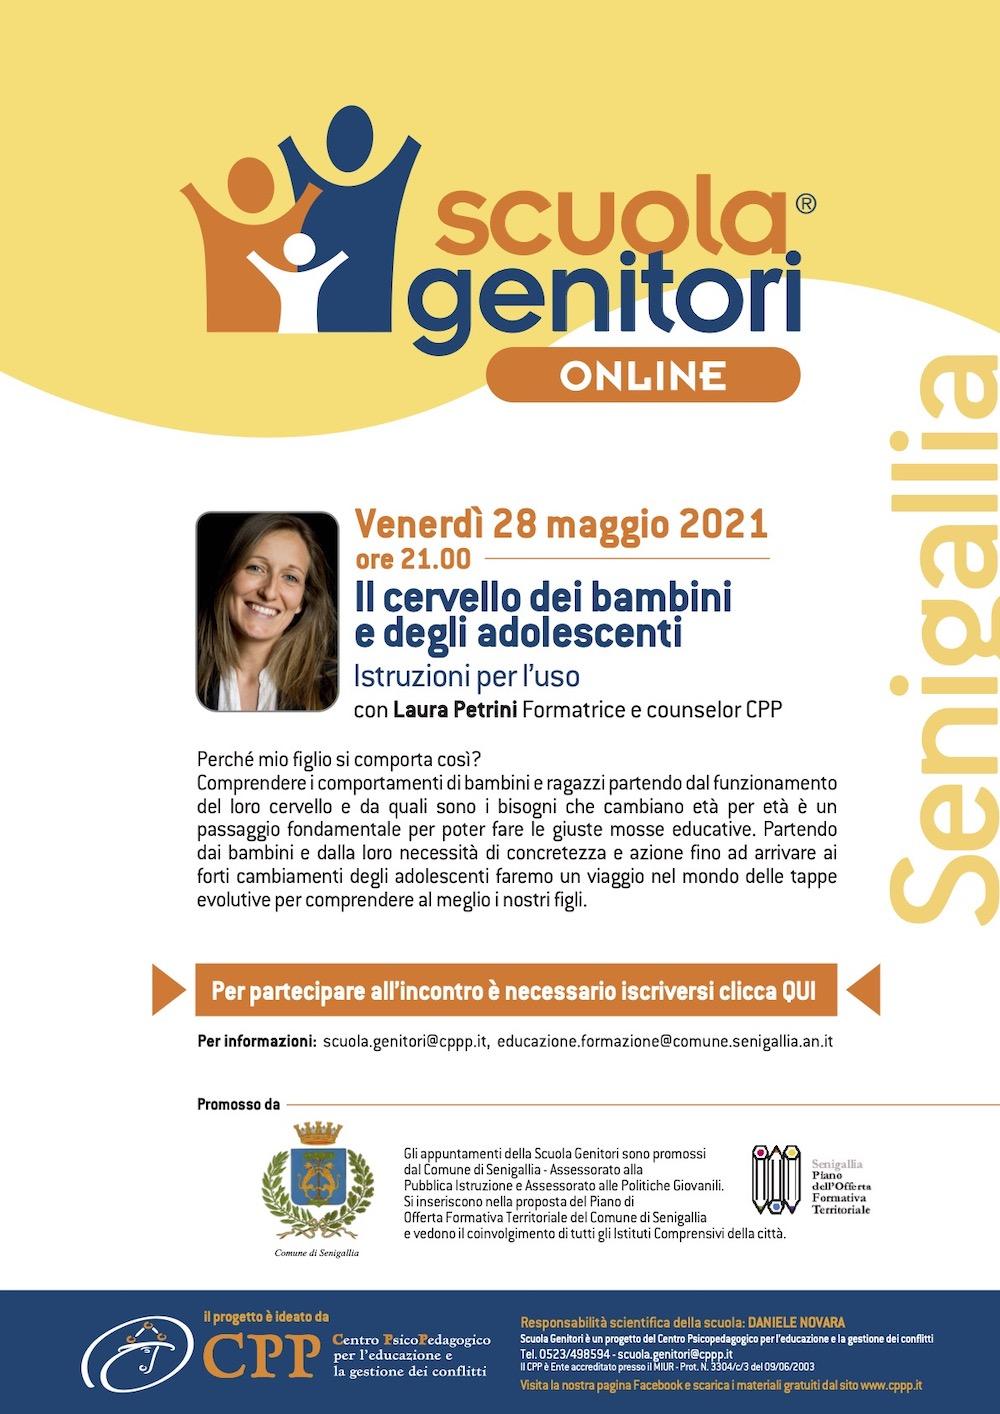 SG Senigallia 2021 con Laura Petrini